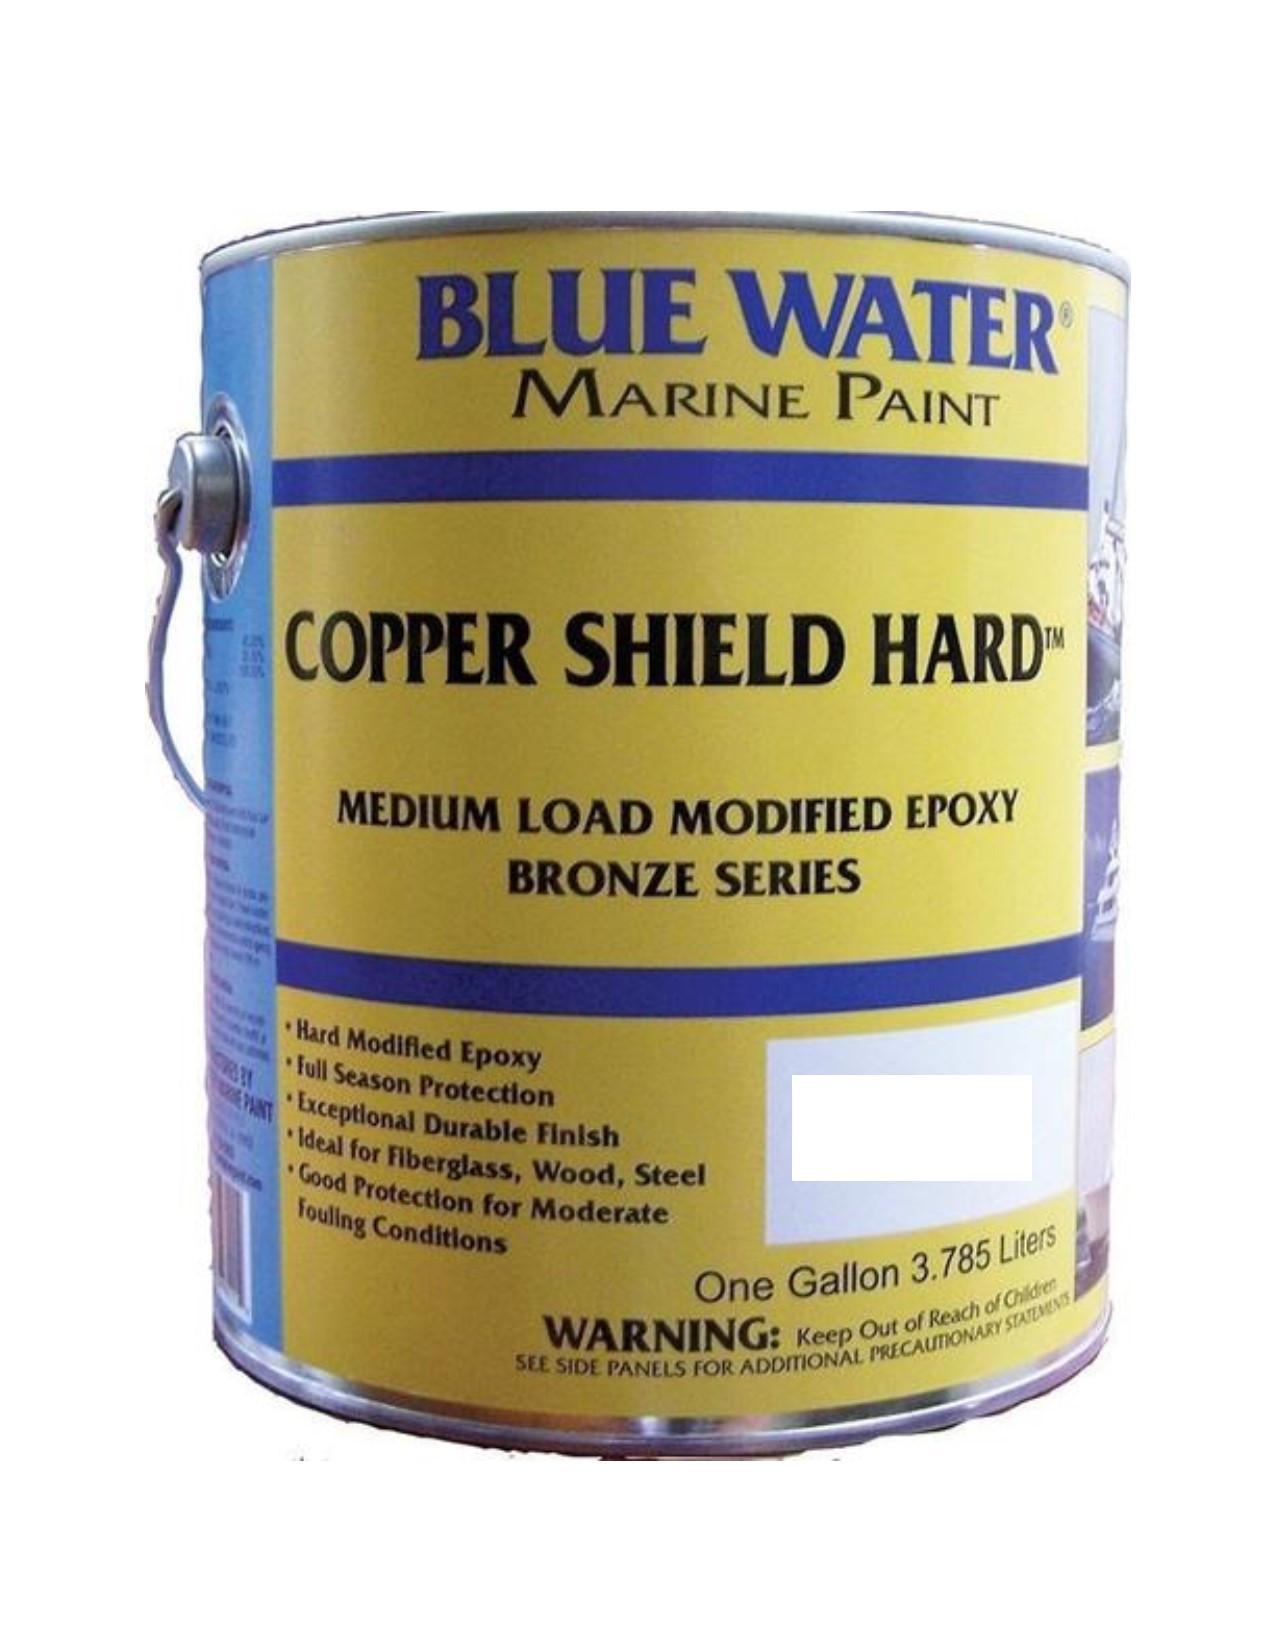 Blue Water Marine Paint, Copper Shield 45 Hard, Admiral Green, 1 Quart